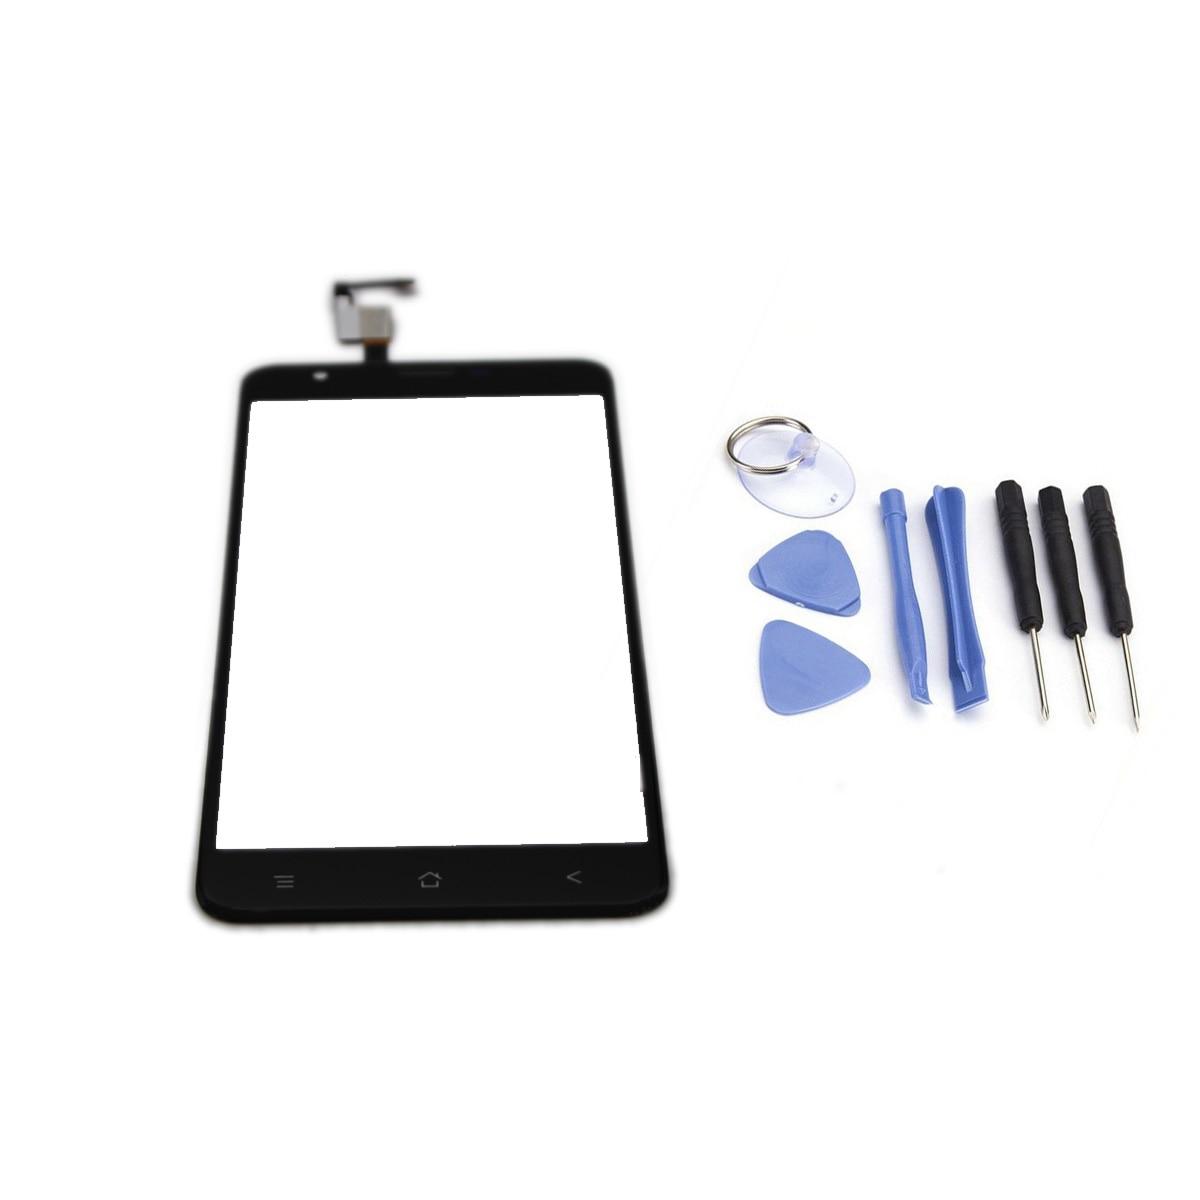 imágenes para Blackview E7 E7S pantalla táctil + Herramientas Conjunto 100% teléfono móvil Original Ensamblaje del panel de cristal Digitalizador Reemplazo para el teléfono celular